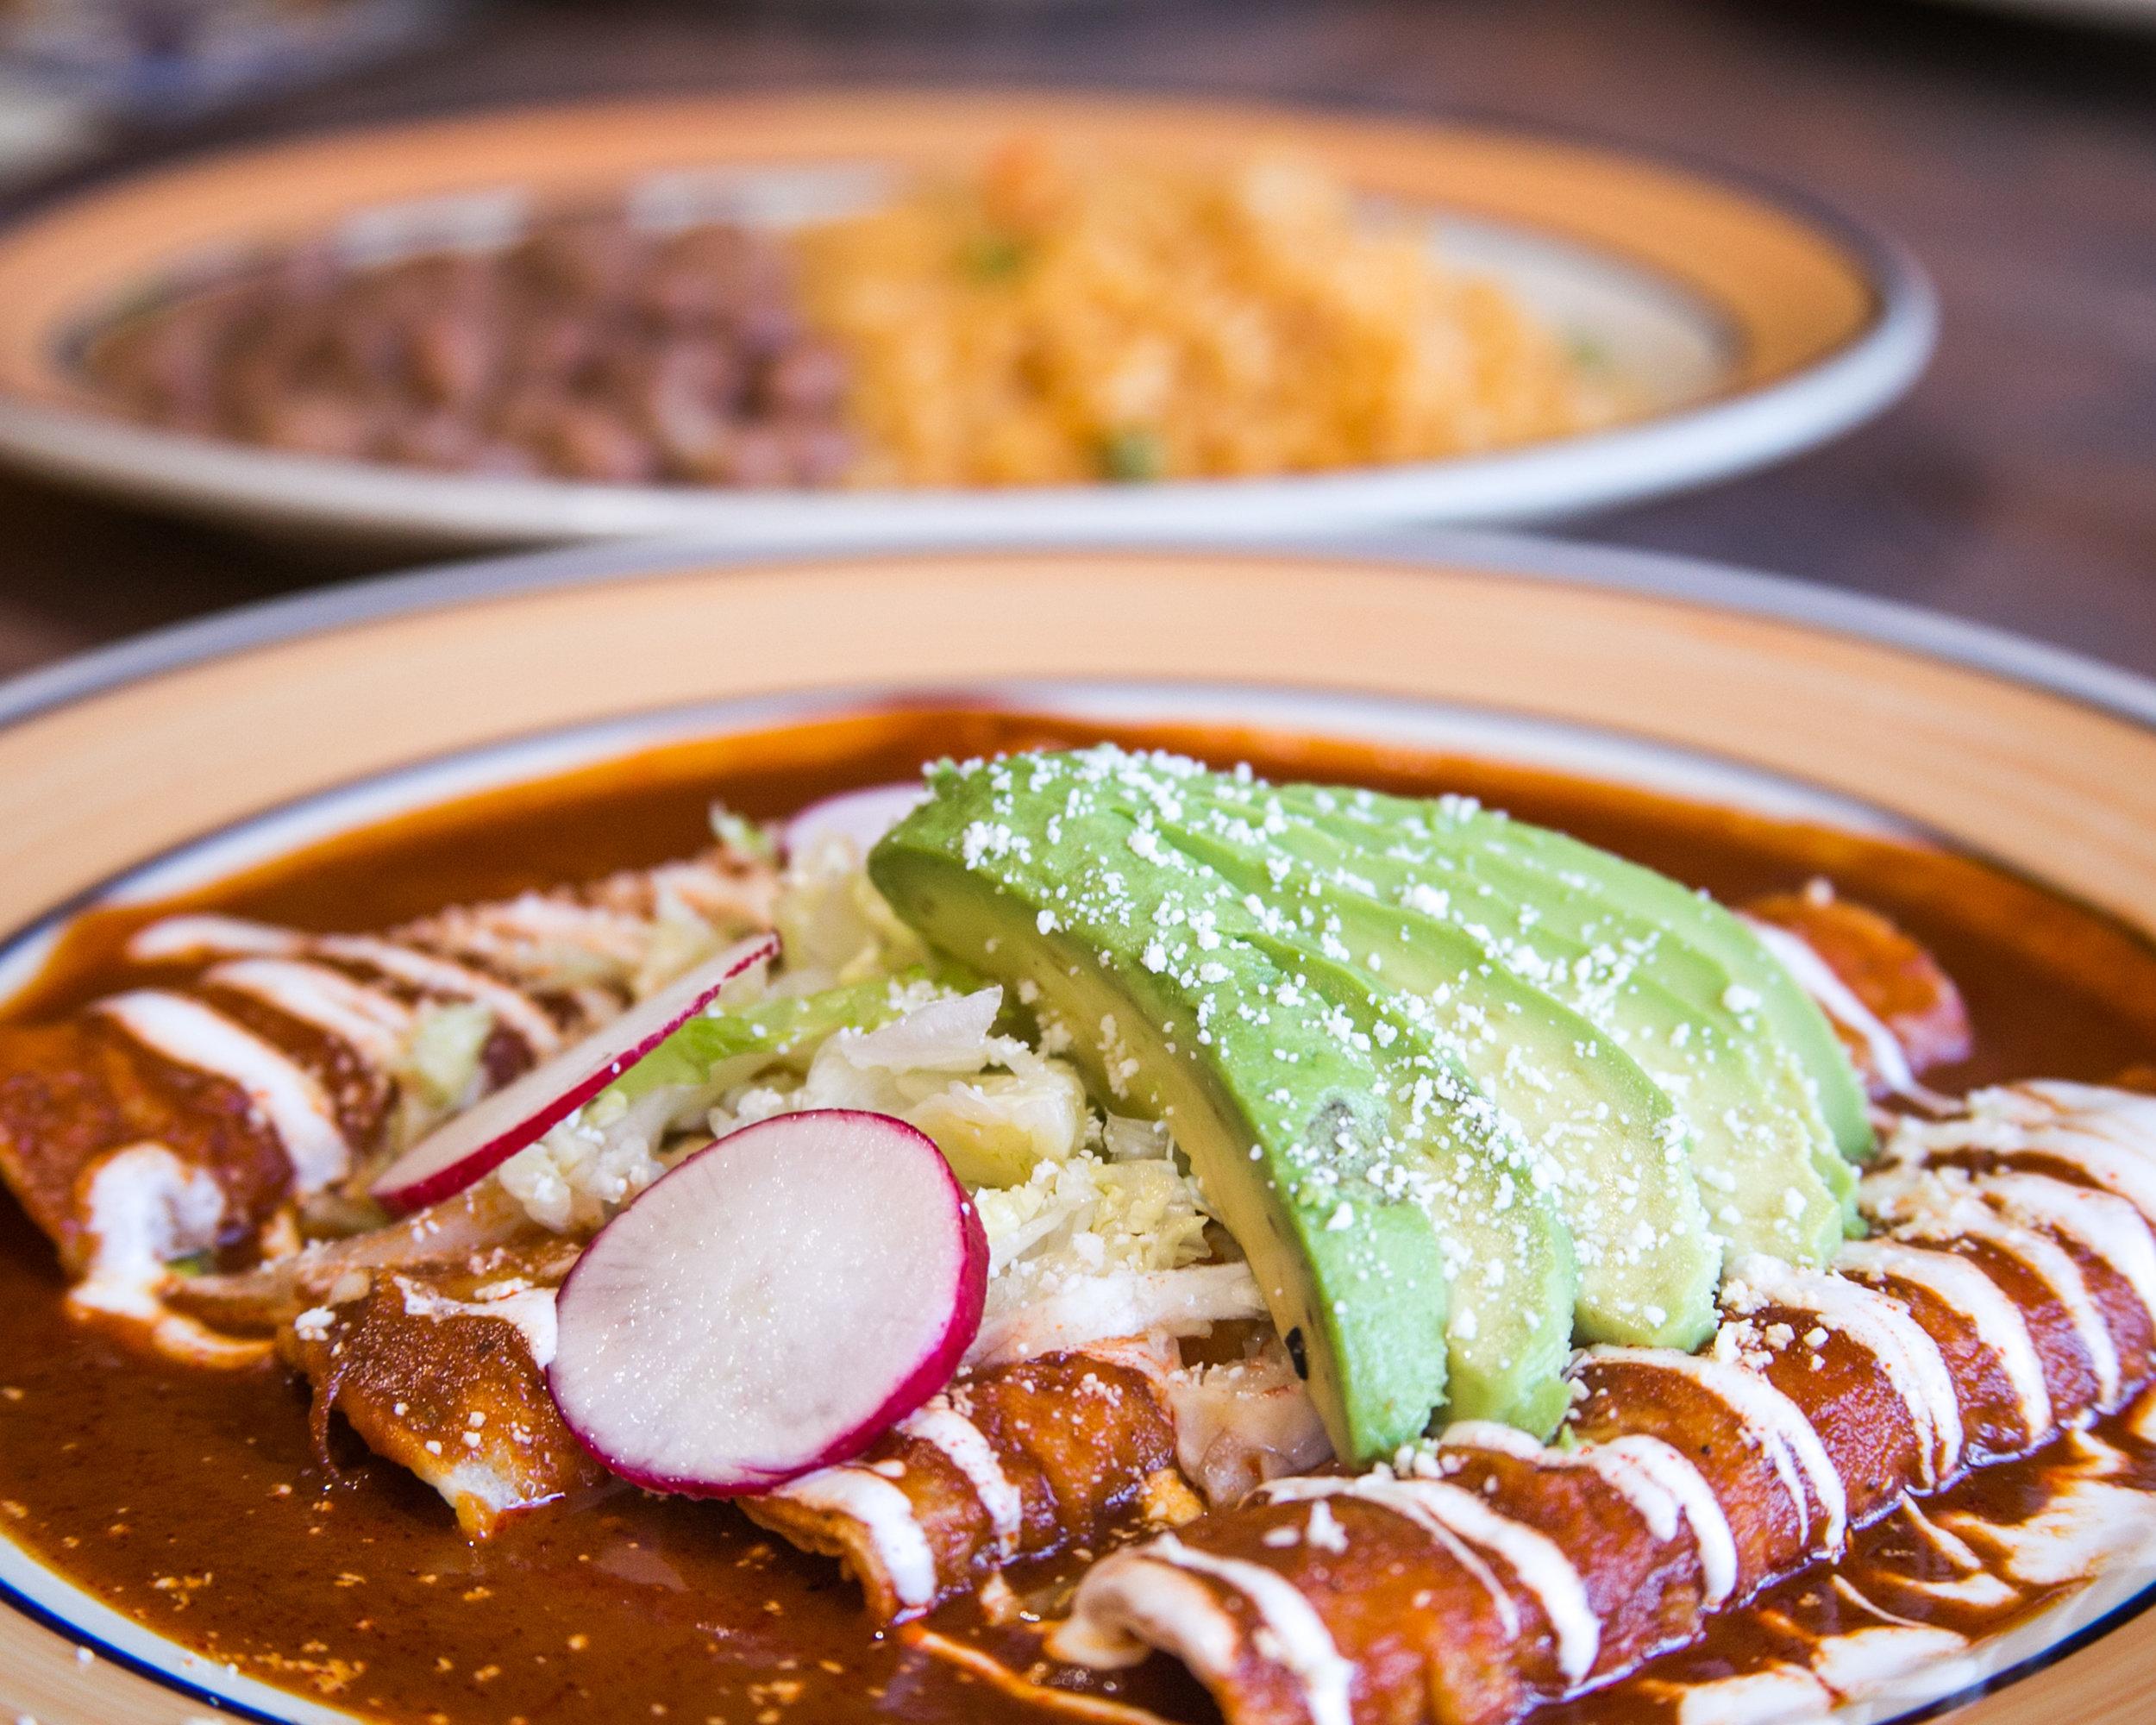 Taco Santana_Enchiladas_2880x2304-4.jpg